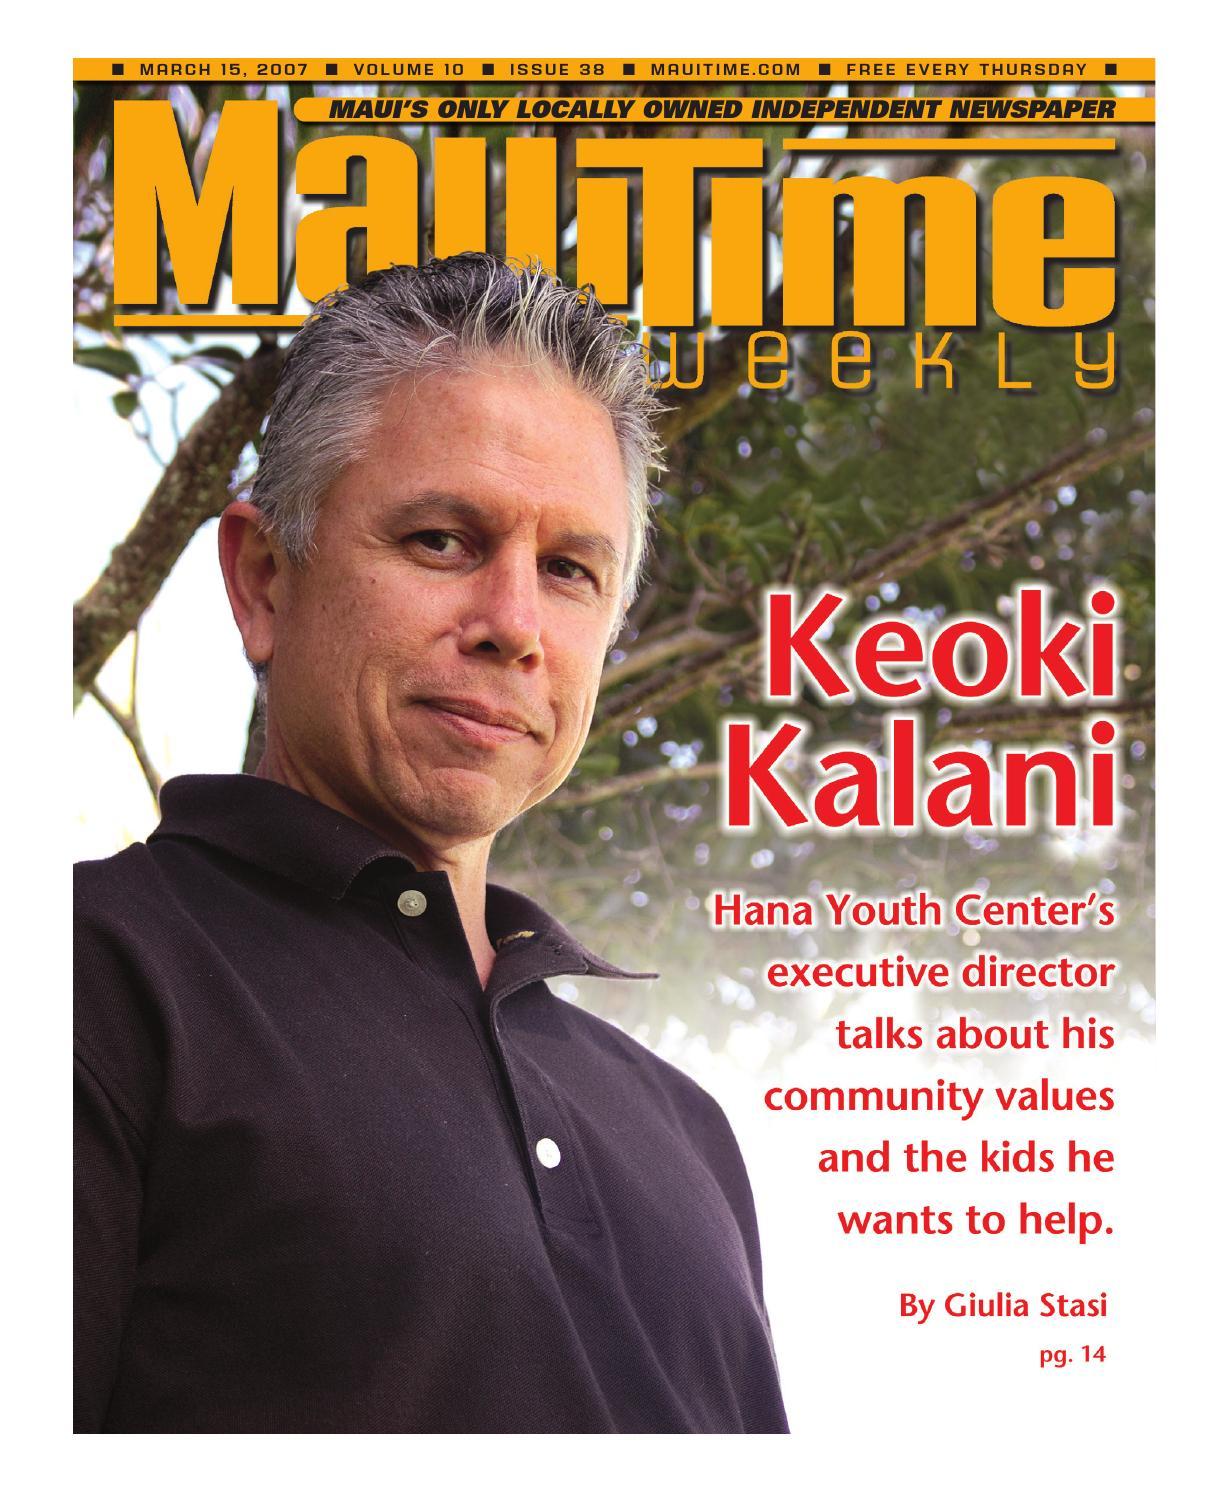 Jim Falk Motors >> 10.38 Keoki Kalani, March 15, 2007, Volume 10, Issue 38 ...